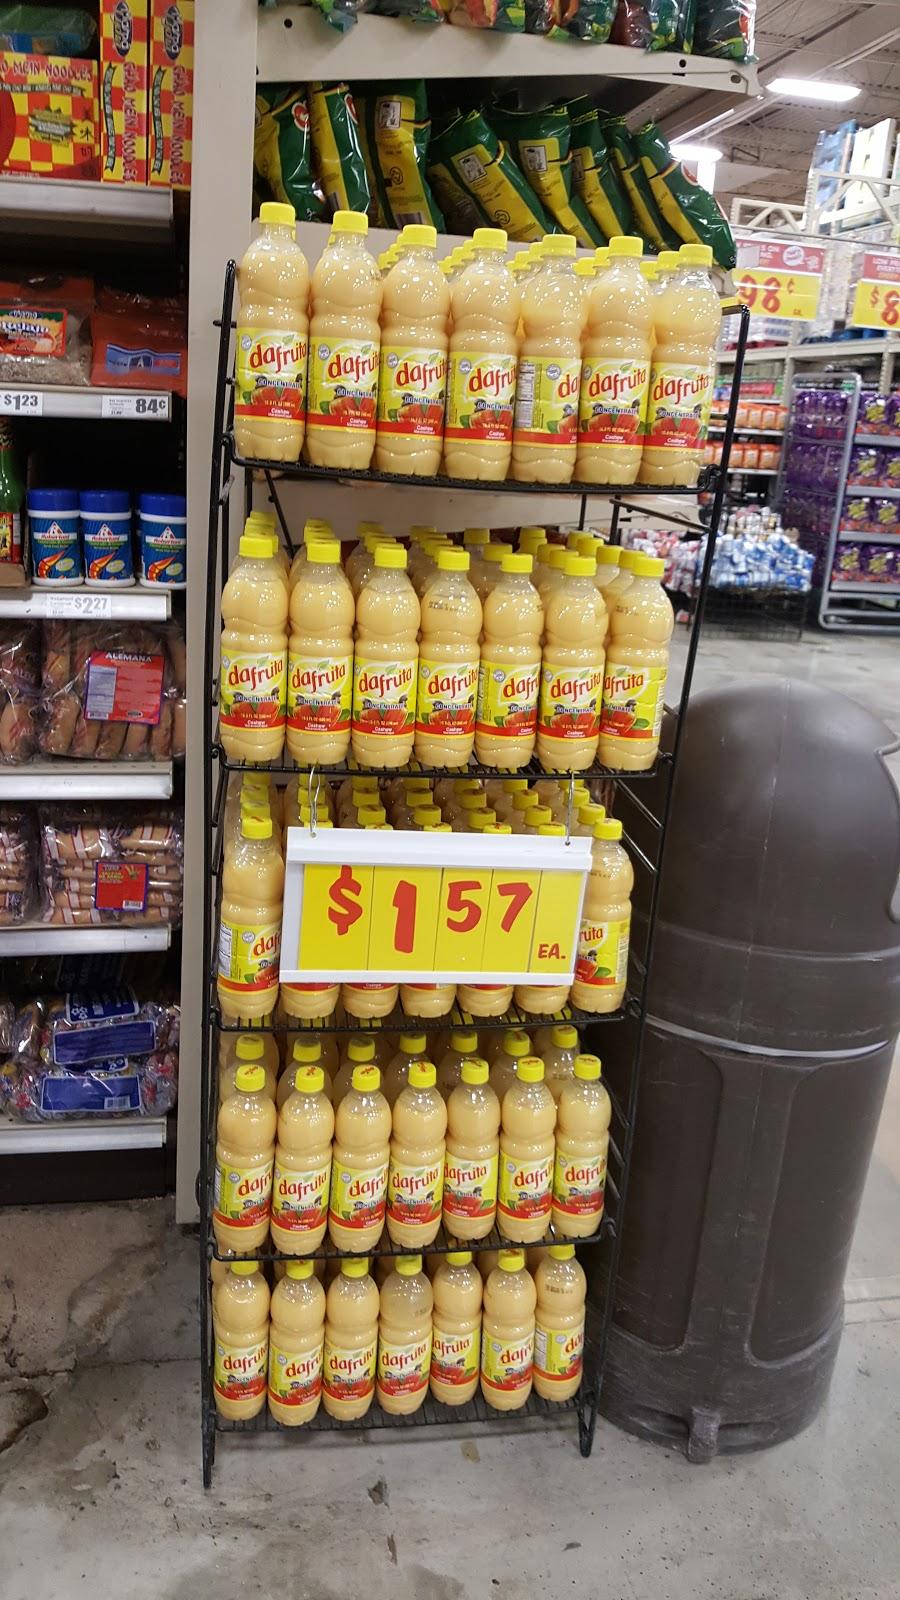 Joe Vs Smart Shop - store  | Photo 6 of 10 | Address: 5609 Uvalde Rd, Houston, TX 77049, USA | Phone: (281) 454-6947